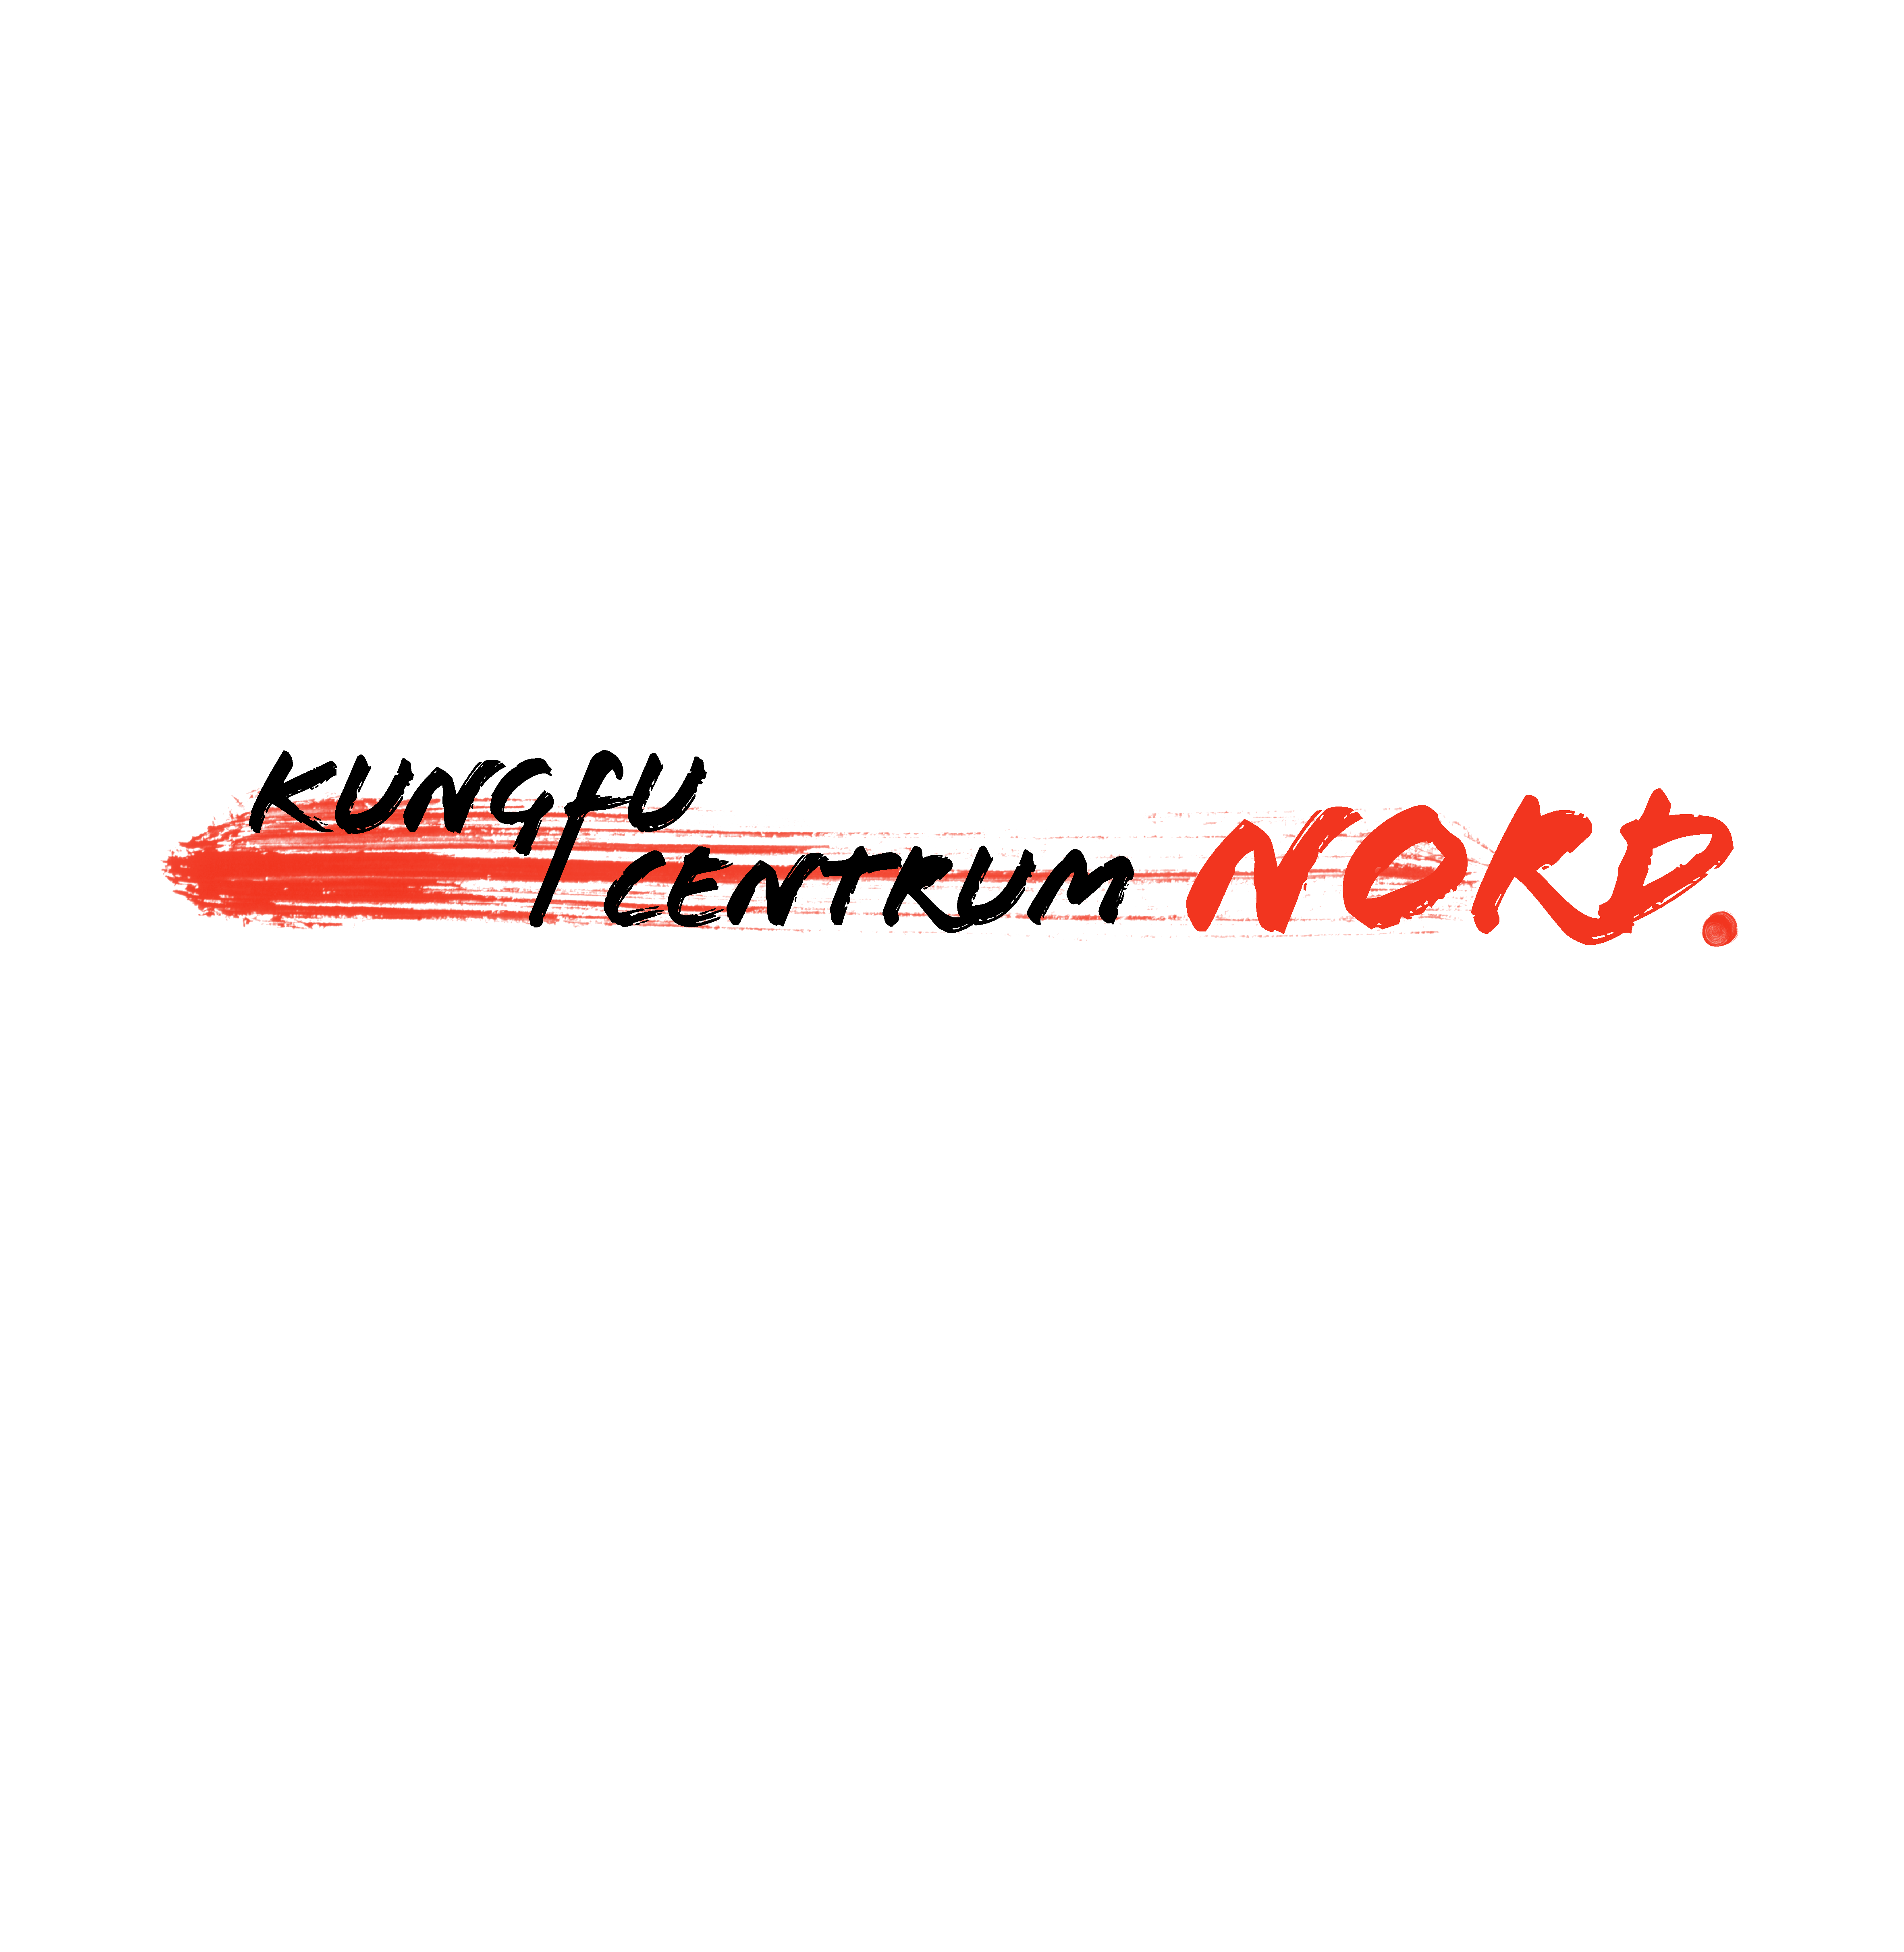 Kung Fu Centrum Nord